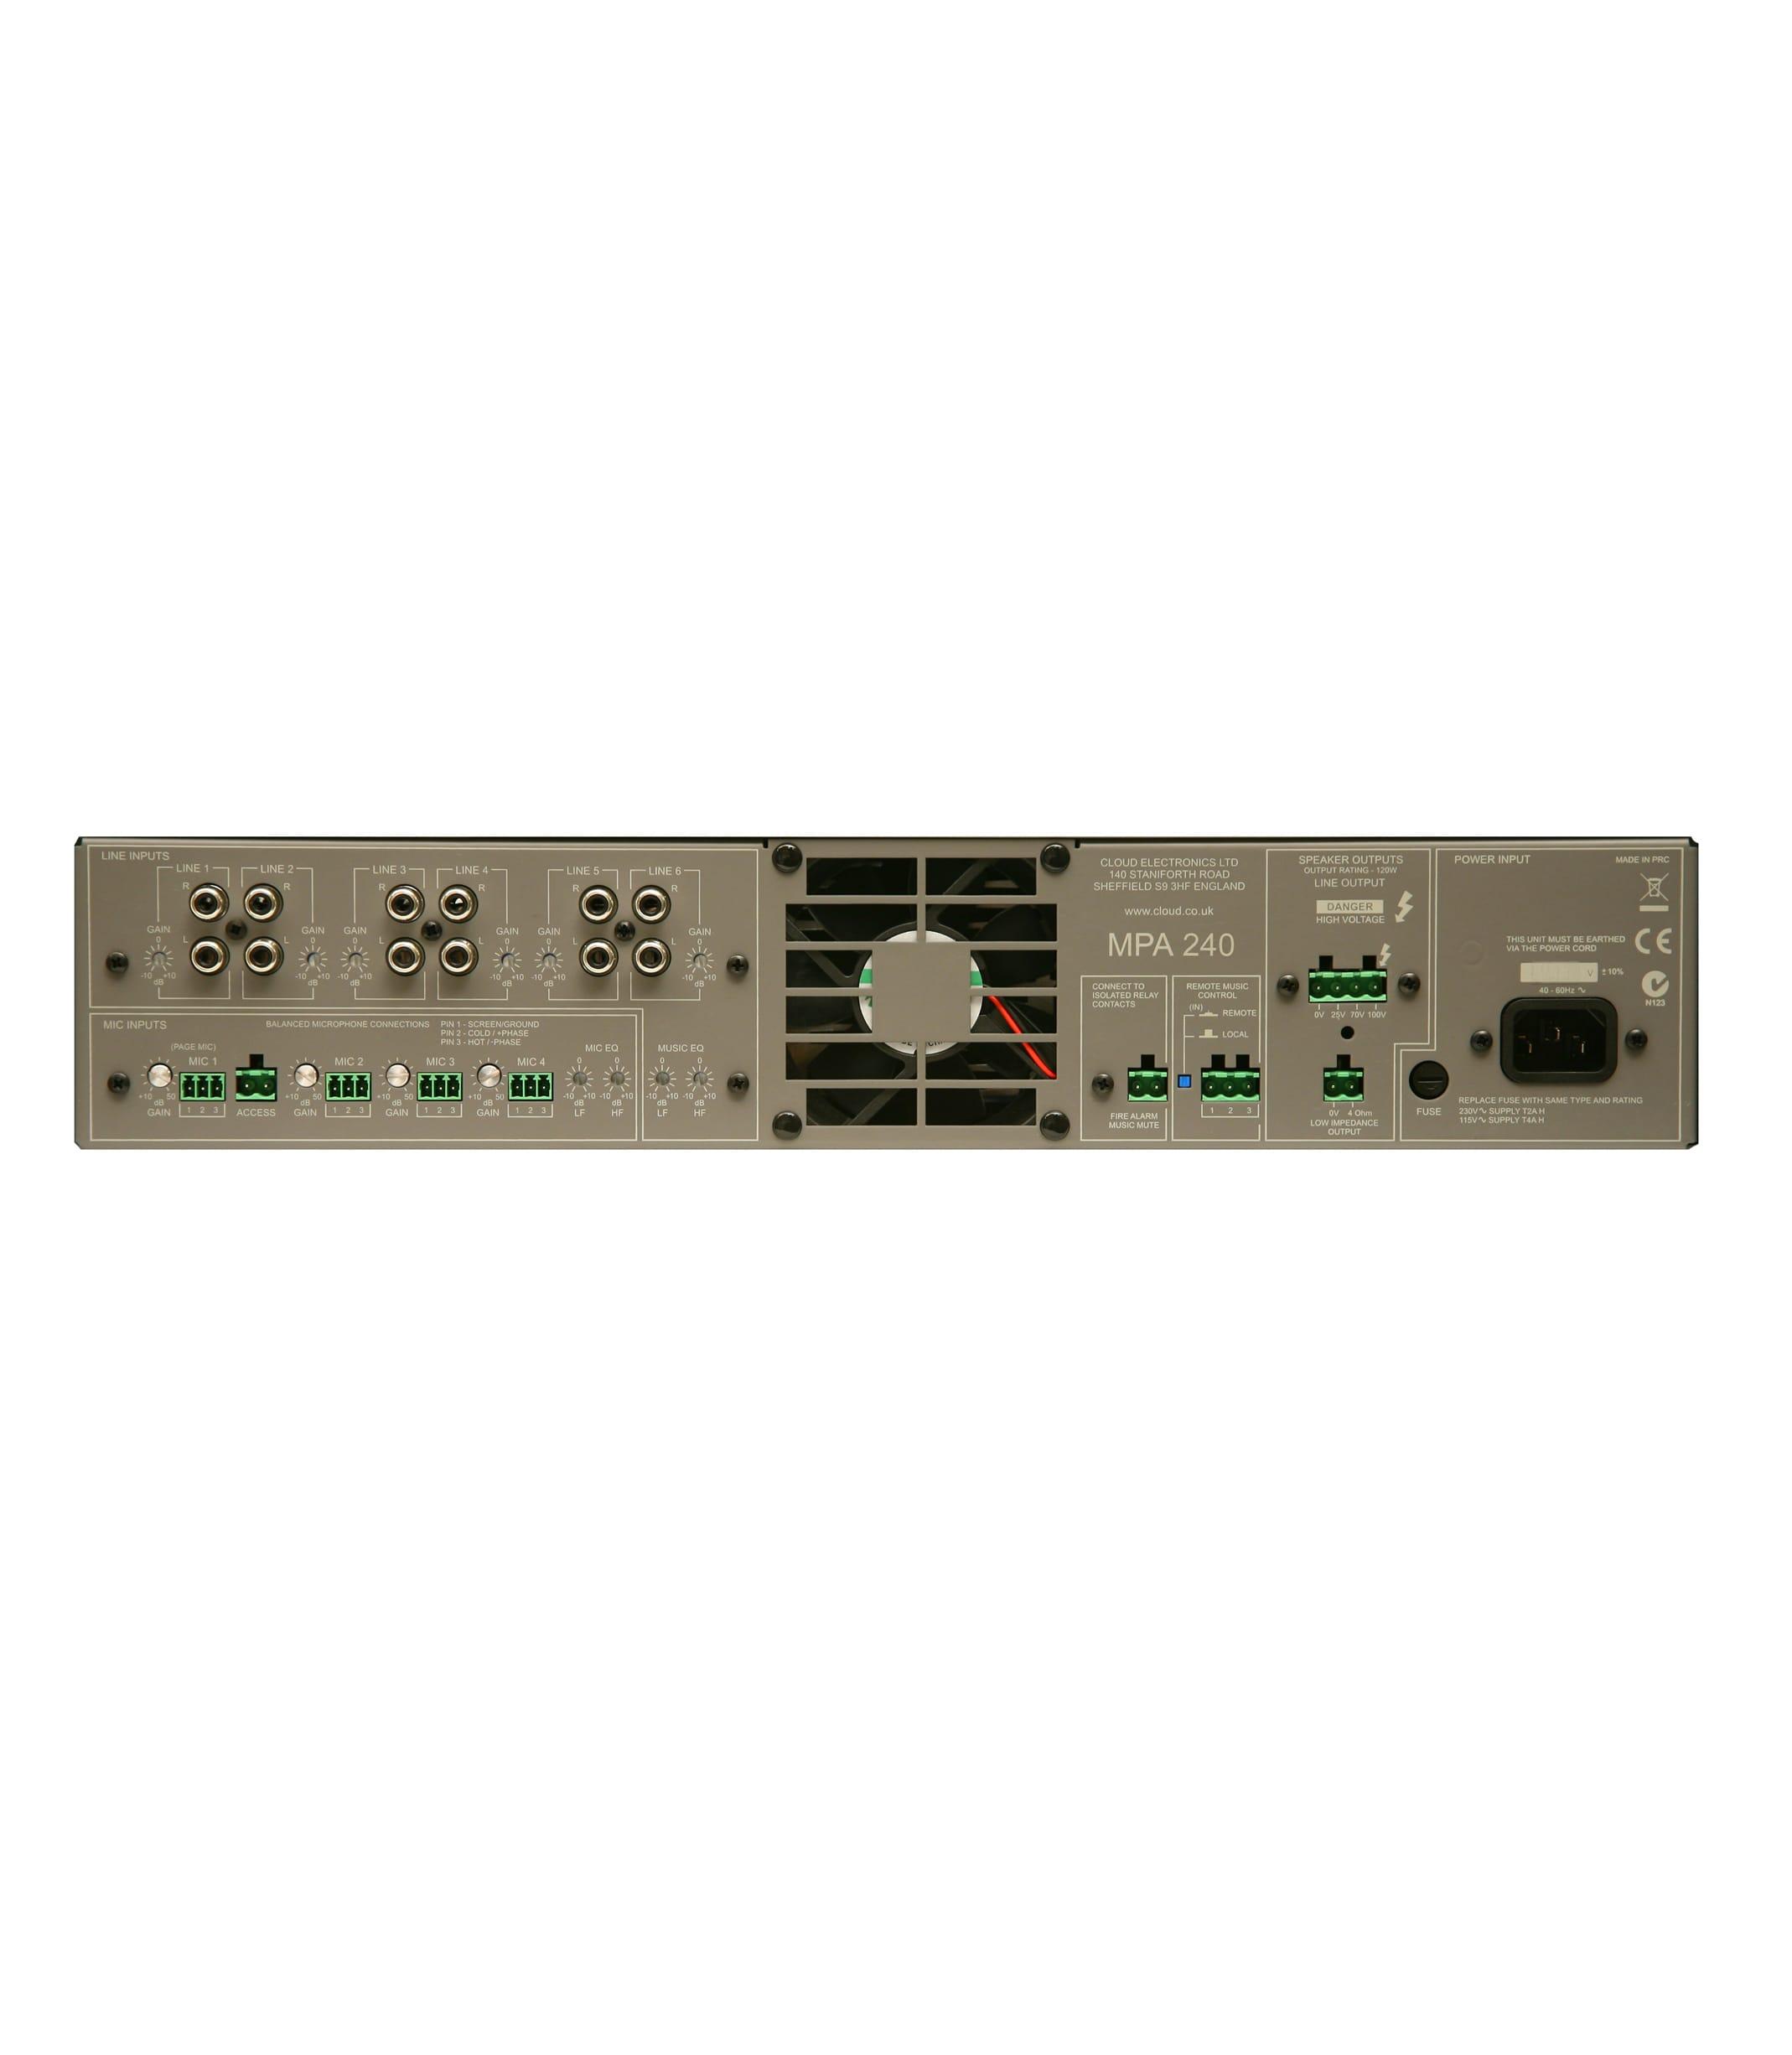 MPA240 - Buy Online